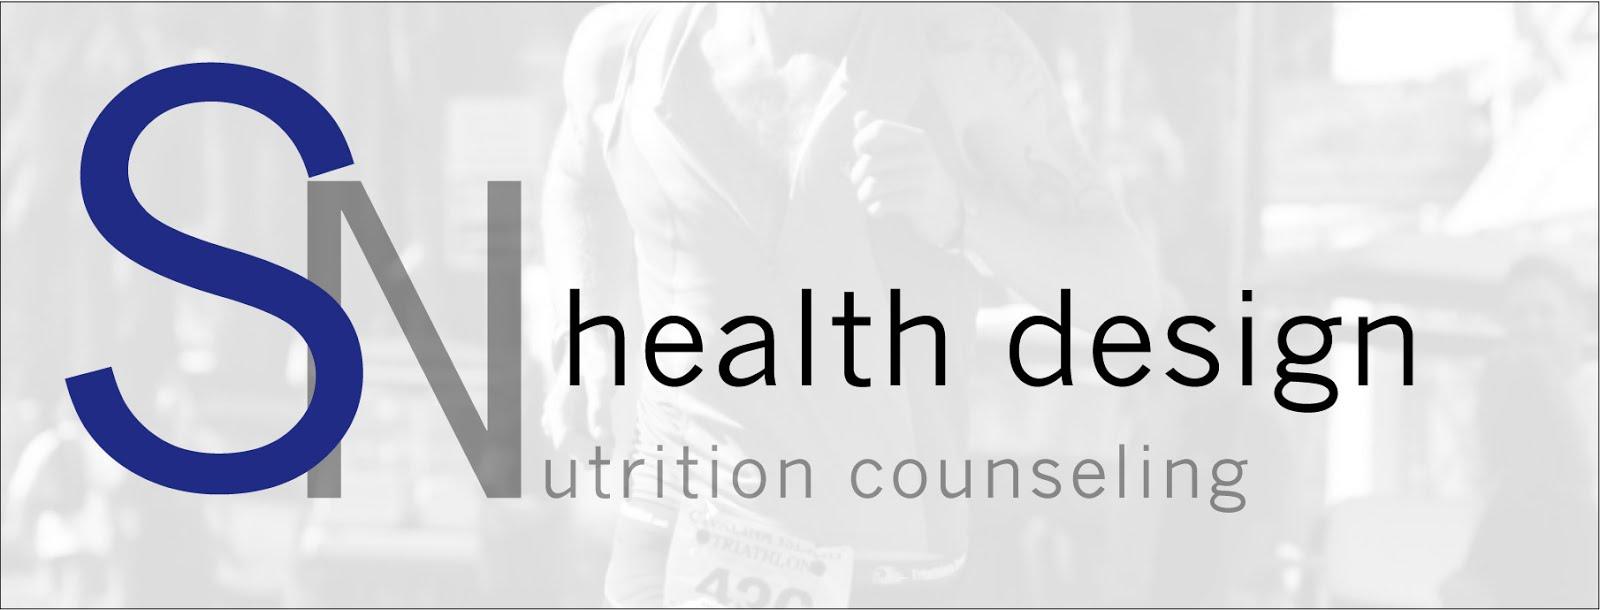 SN health design